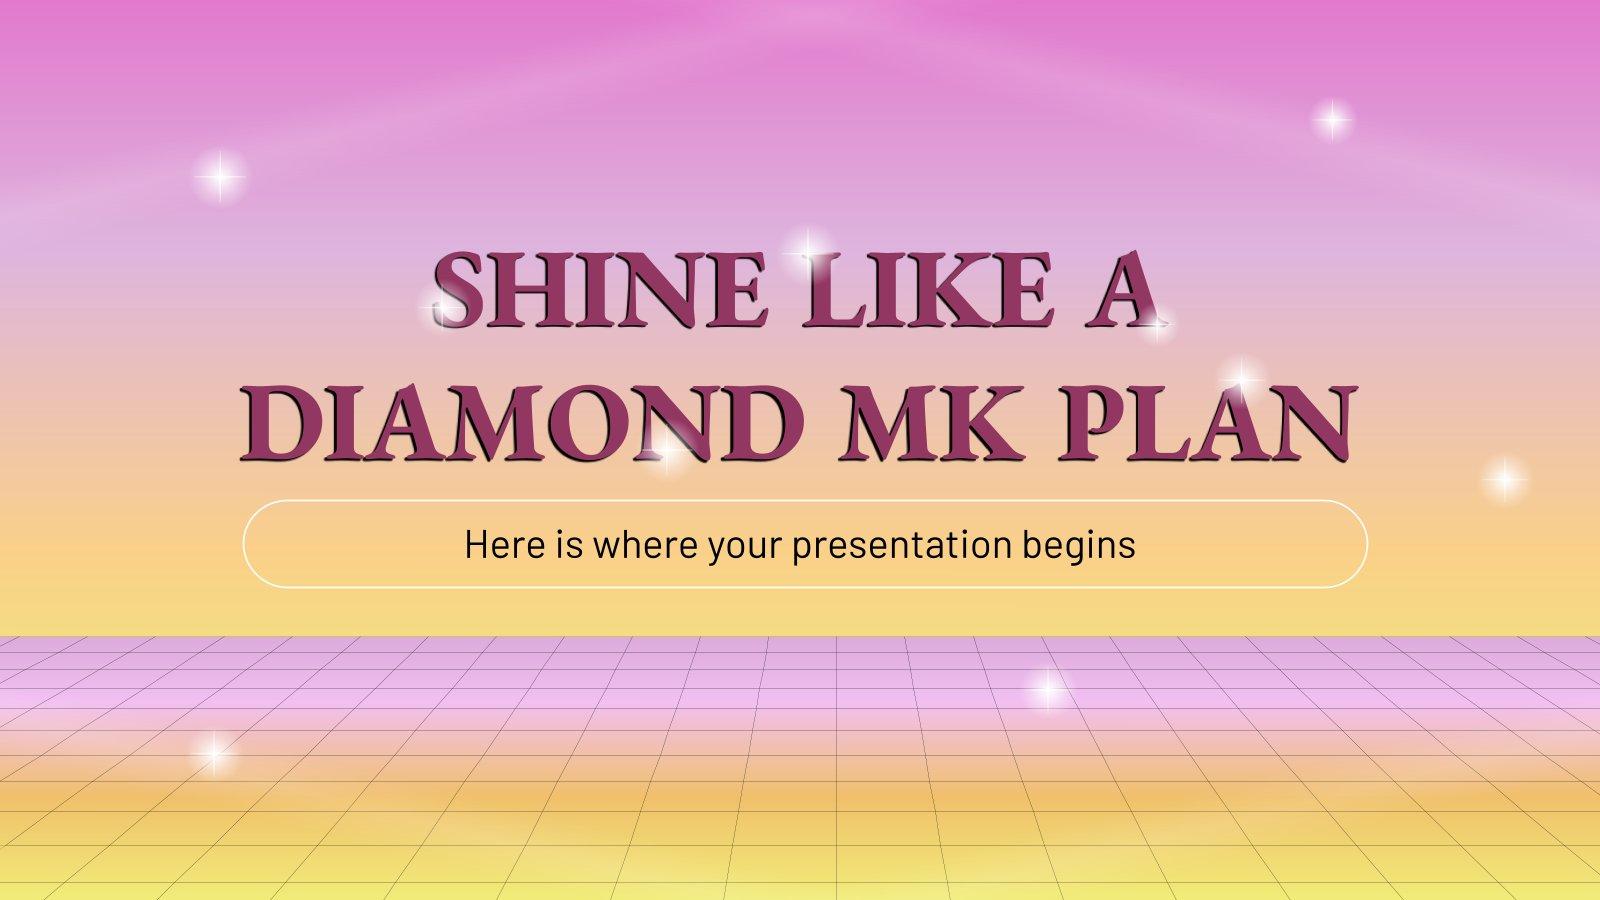 Shine Like a Diamond MK Plan presentation template